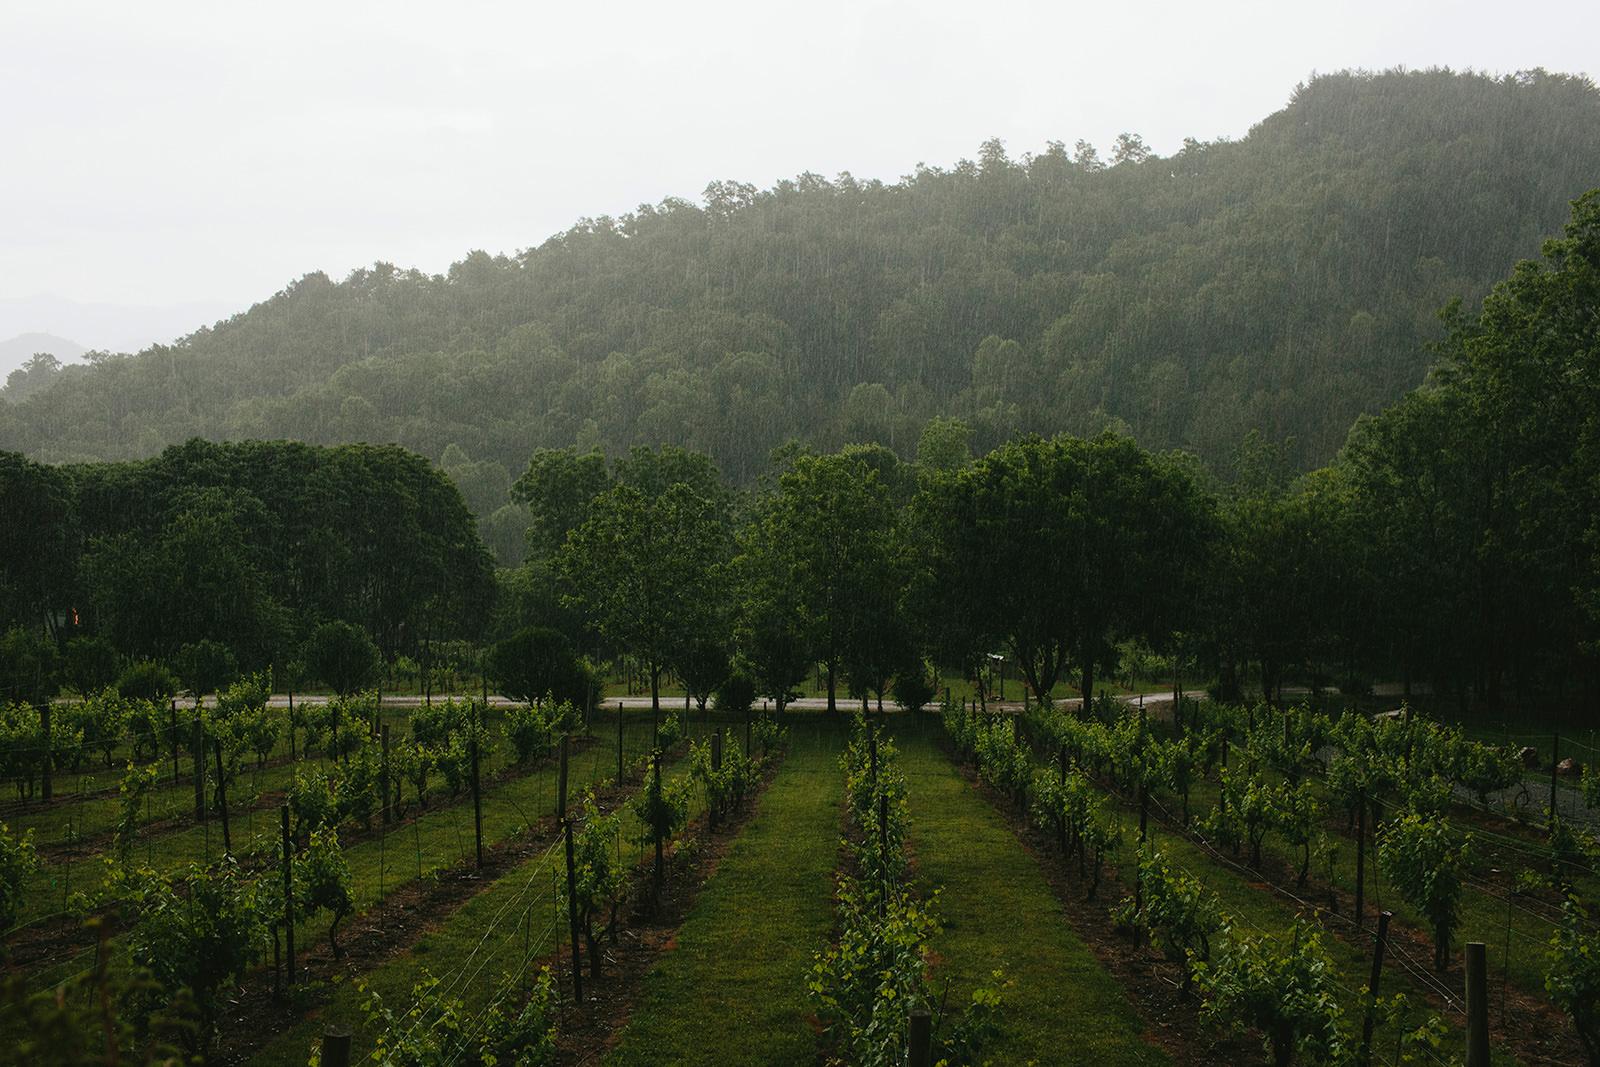 vineyards at bettys creek